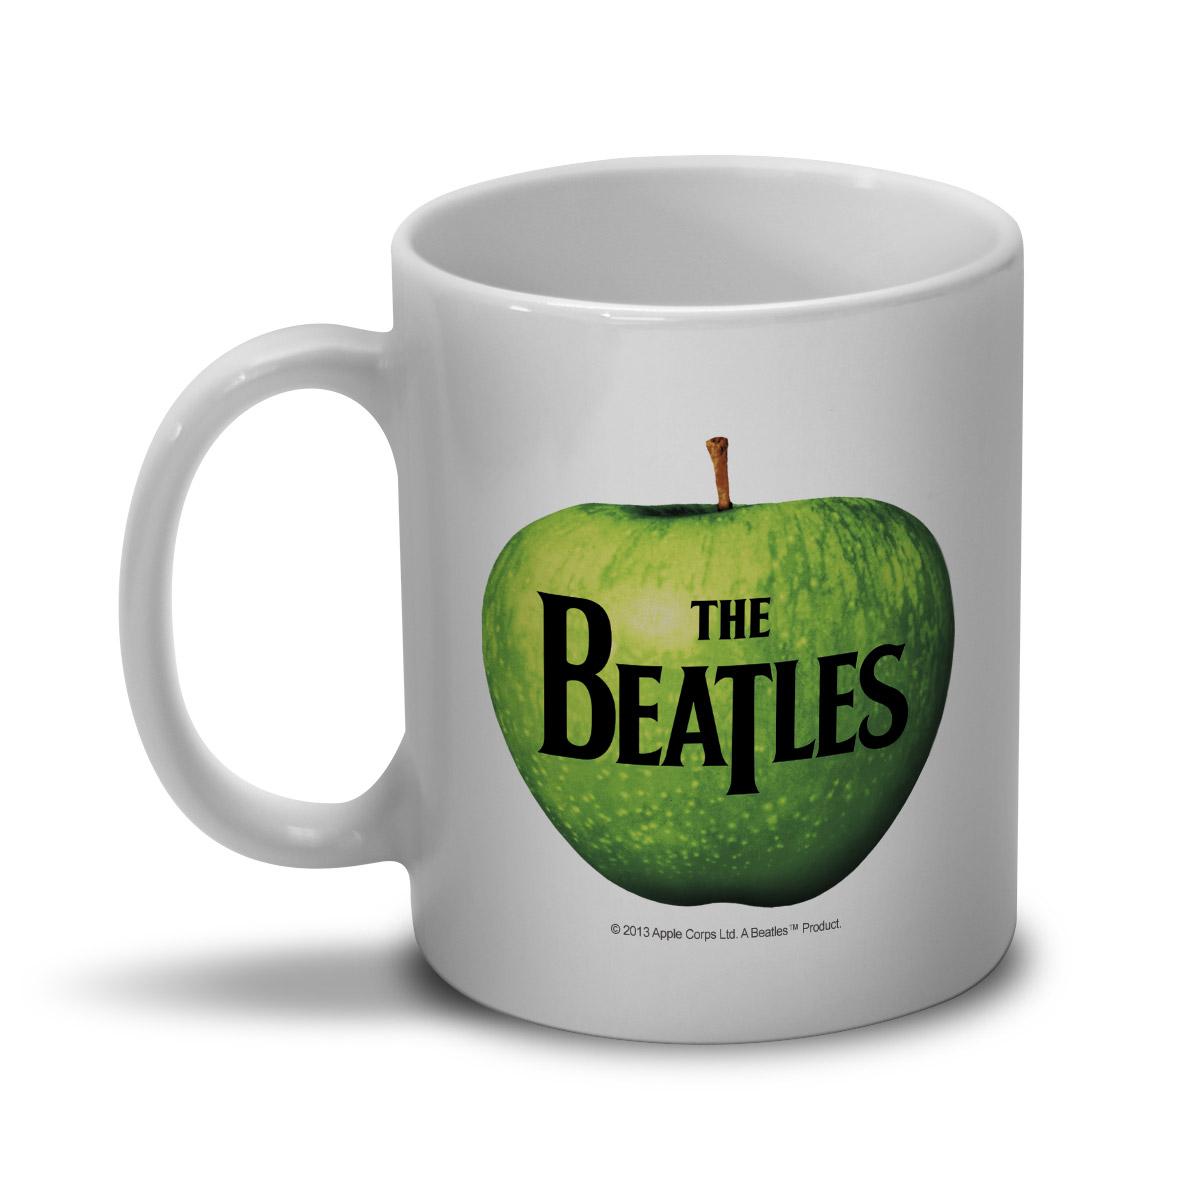 Caneca The Beatles Apple 2